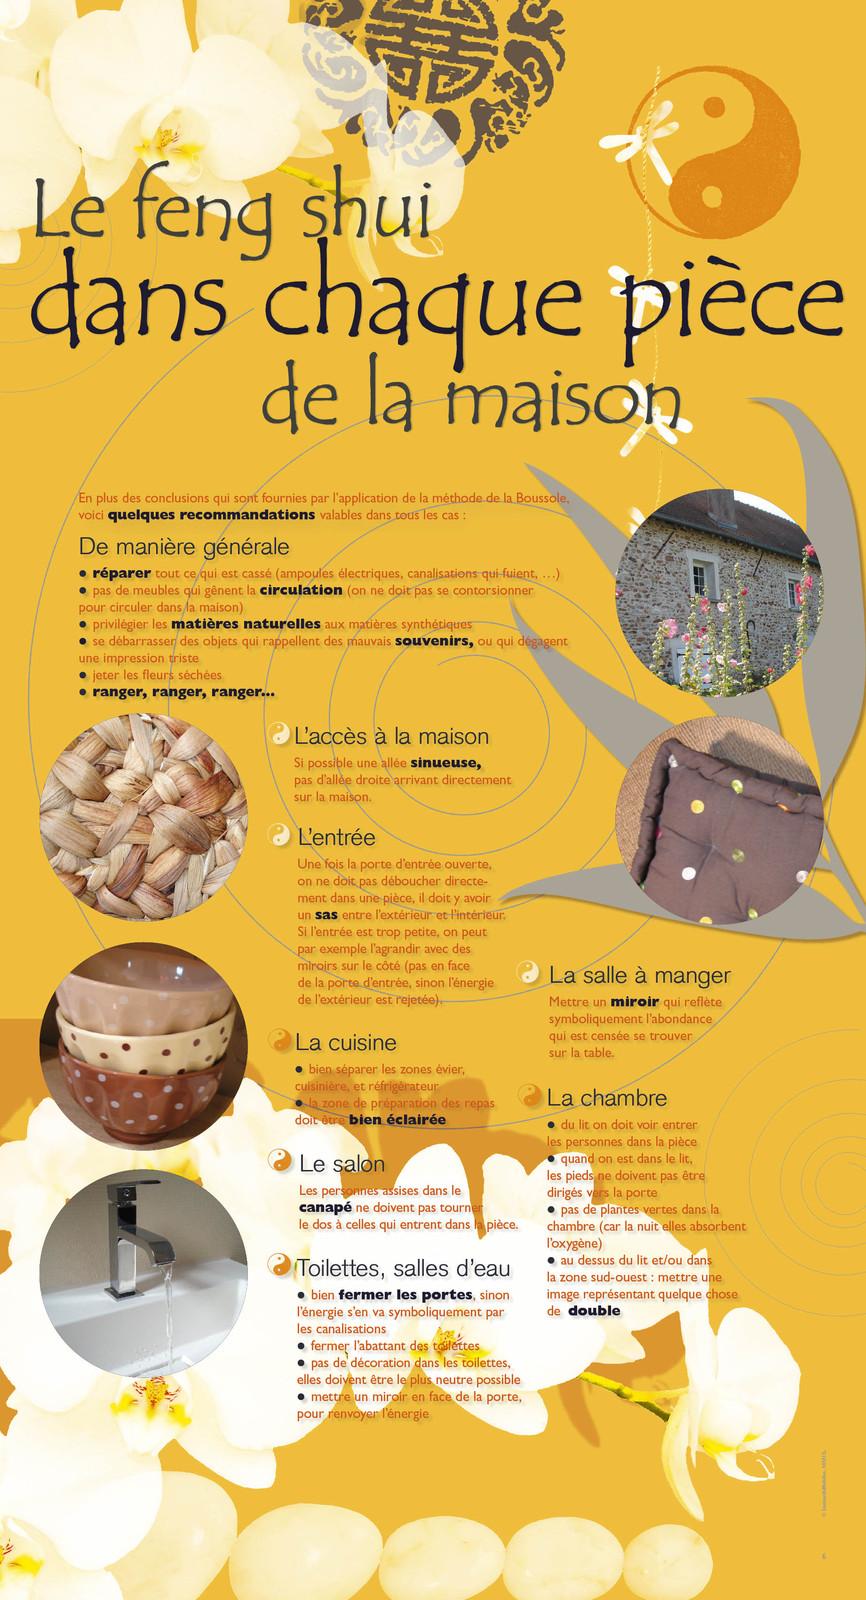 Mettre Un Miroir Dans Une Cuisine feng shui exposition instants mobiles (6